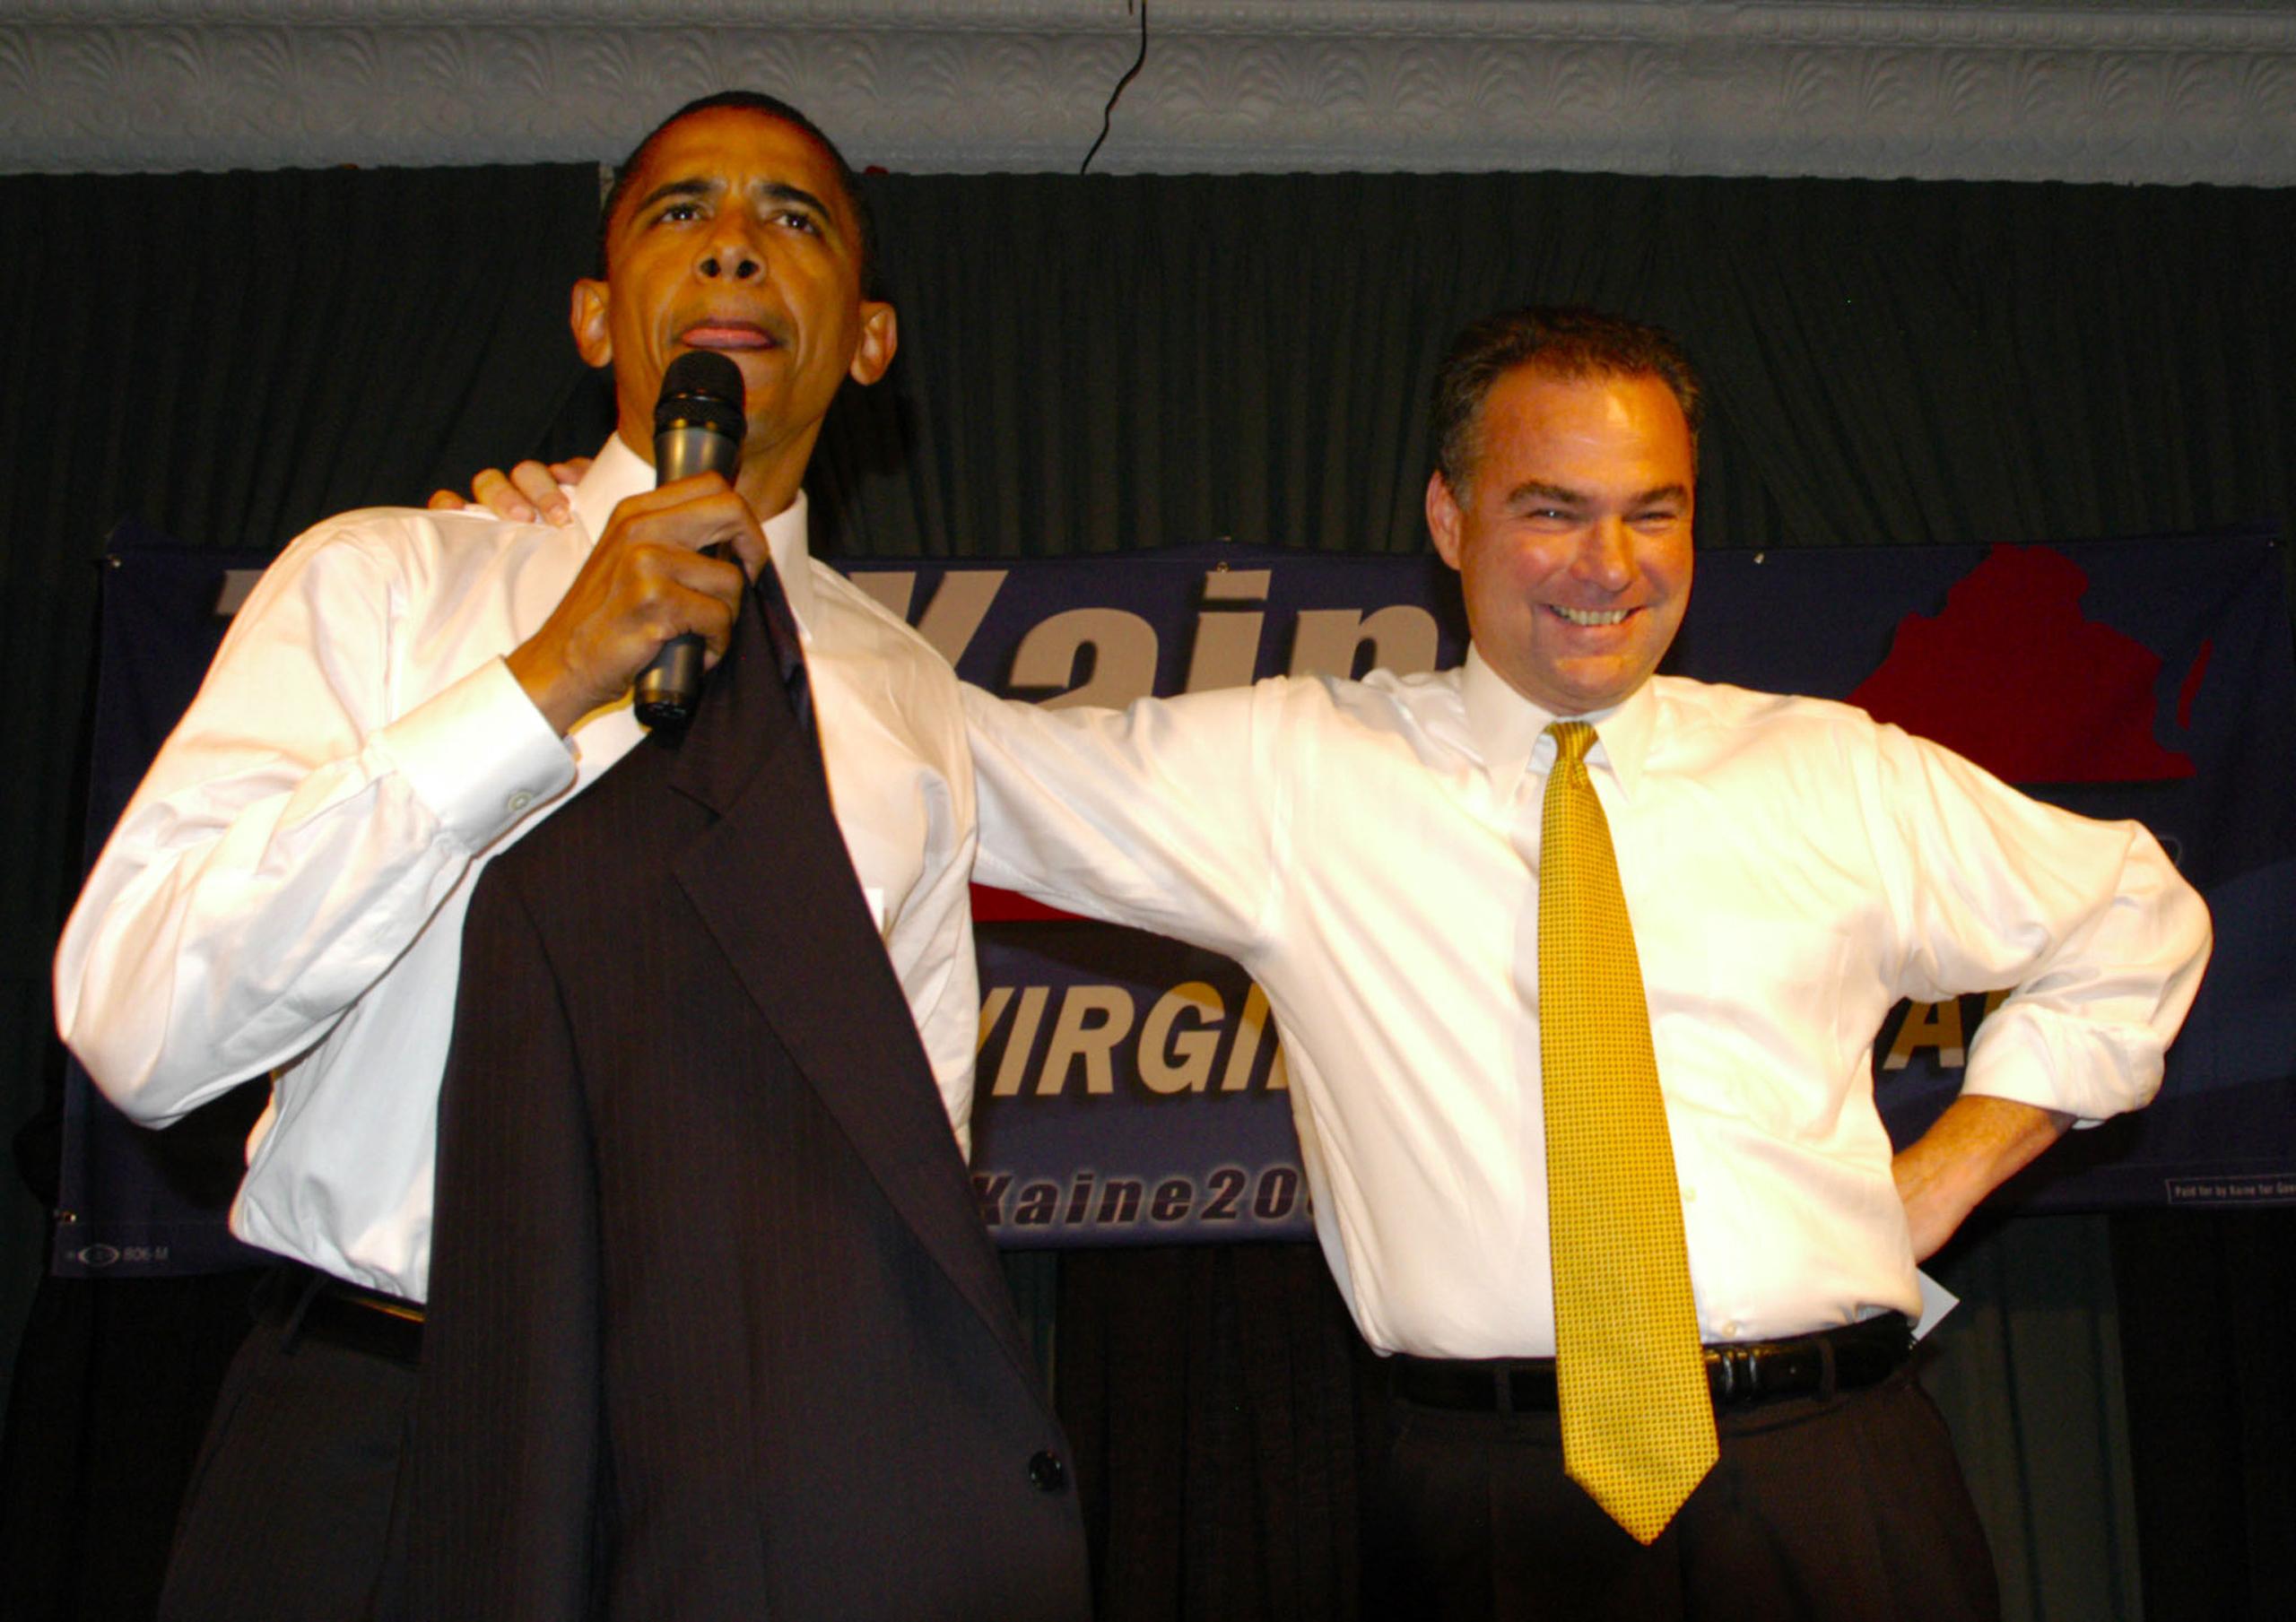 Senator Barack Obama, left, lends support to Tim Kaine who is running for Va.. Governor in Arlington, Va. on July 20, 2005.